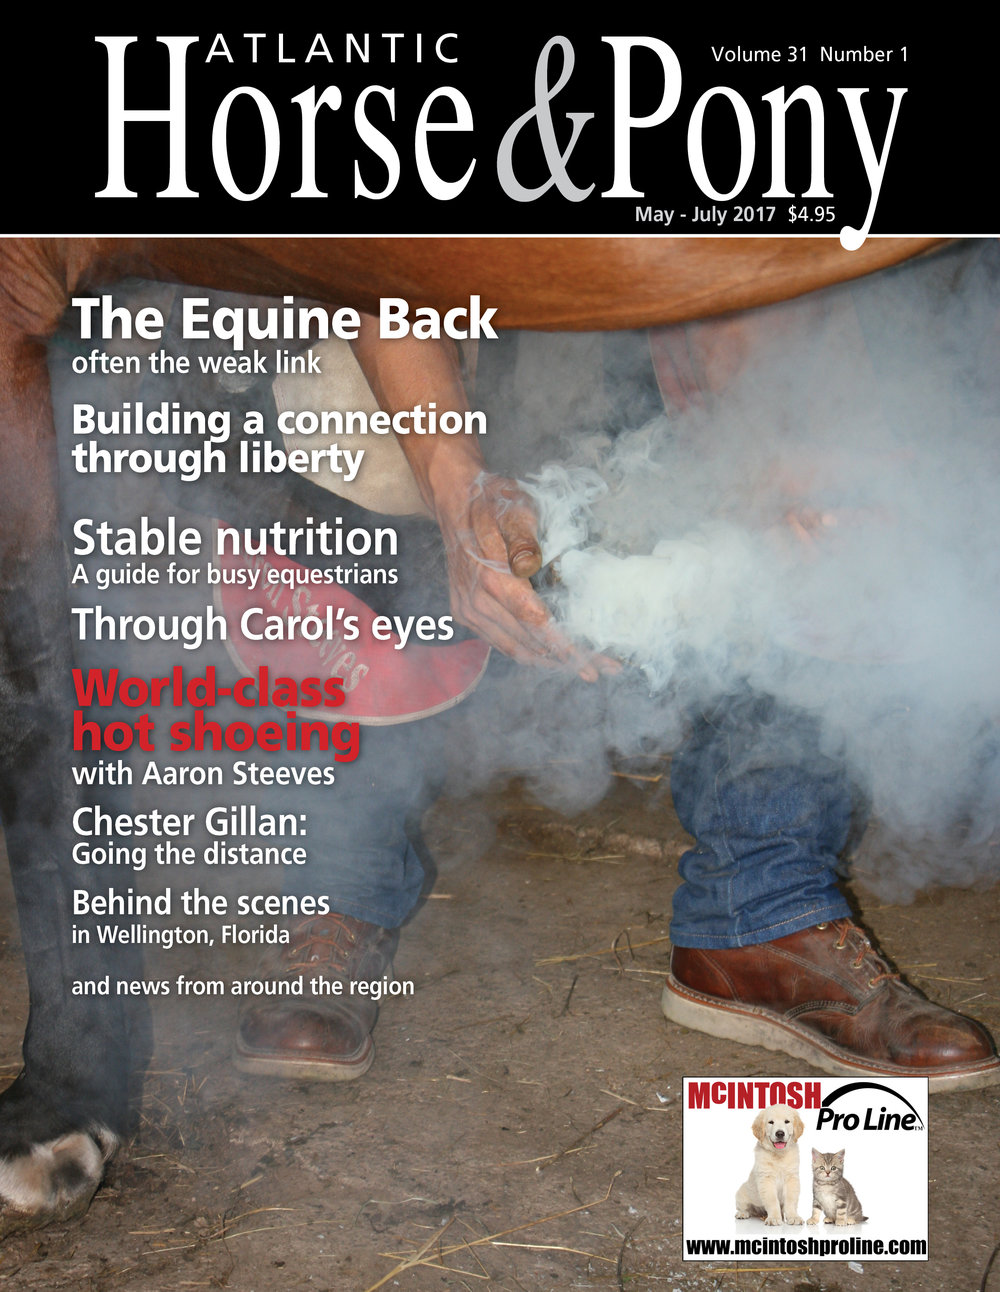 HorsePonyMay2017.jpg